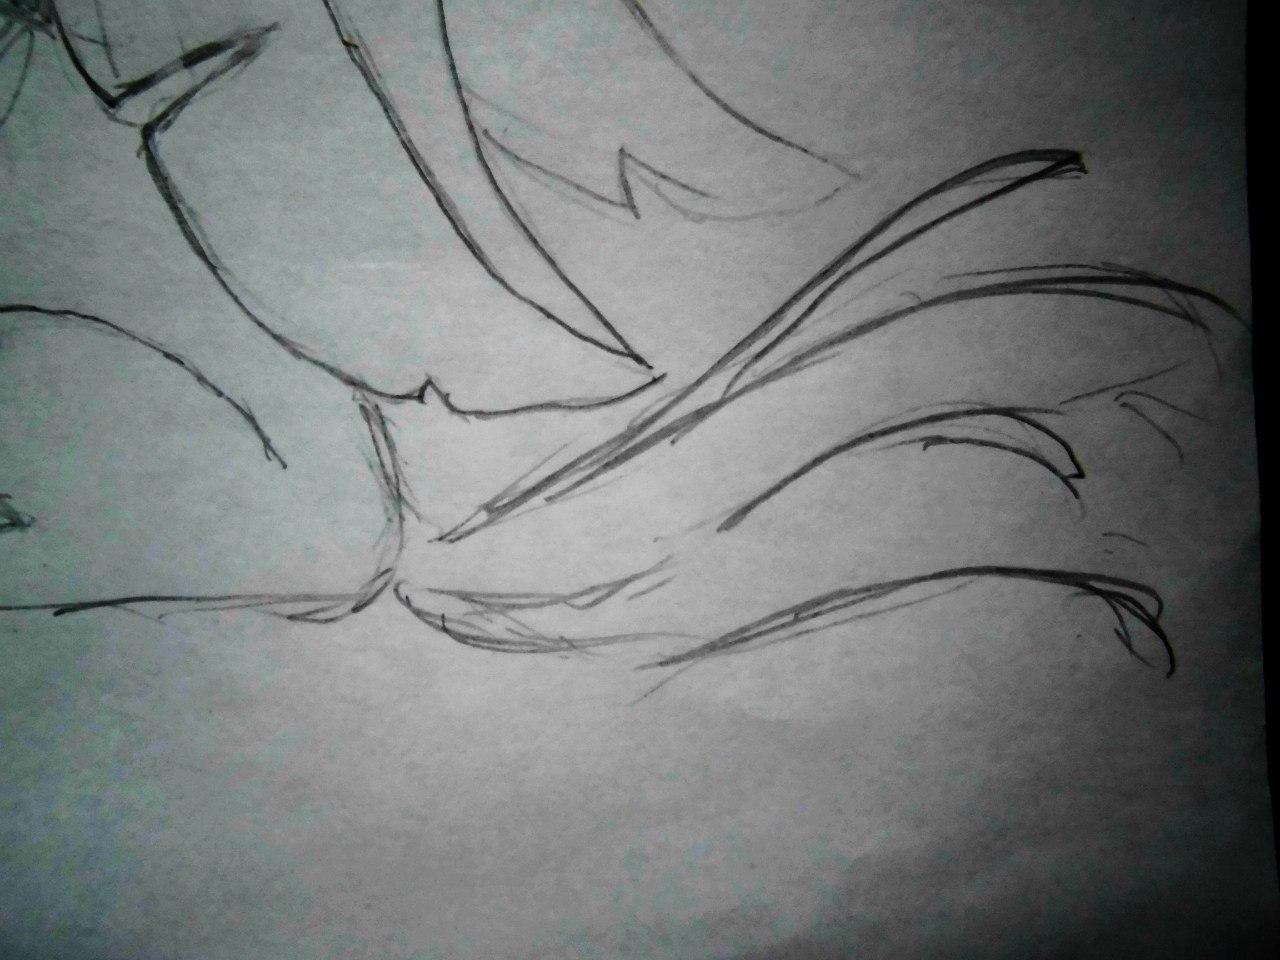 Рисуем аниме лисёнок с бабочкой на носу - шаг 4